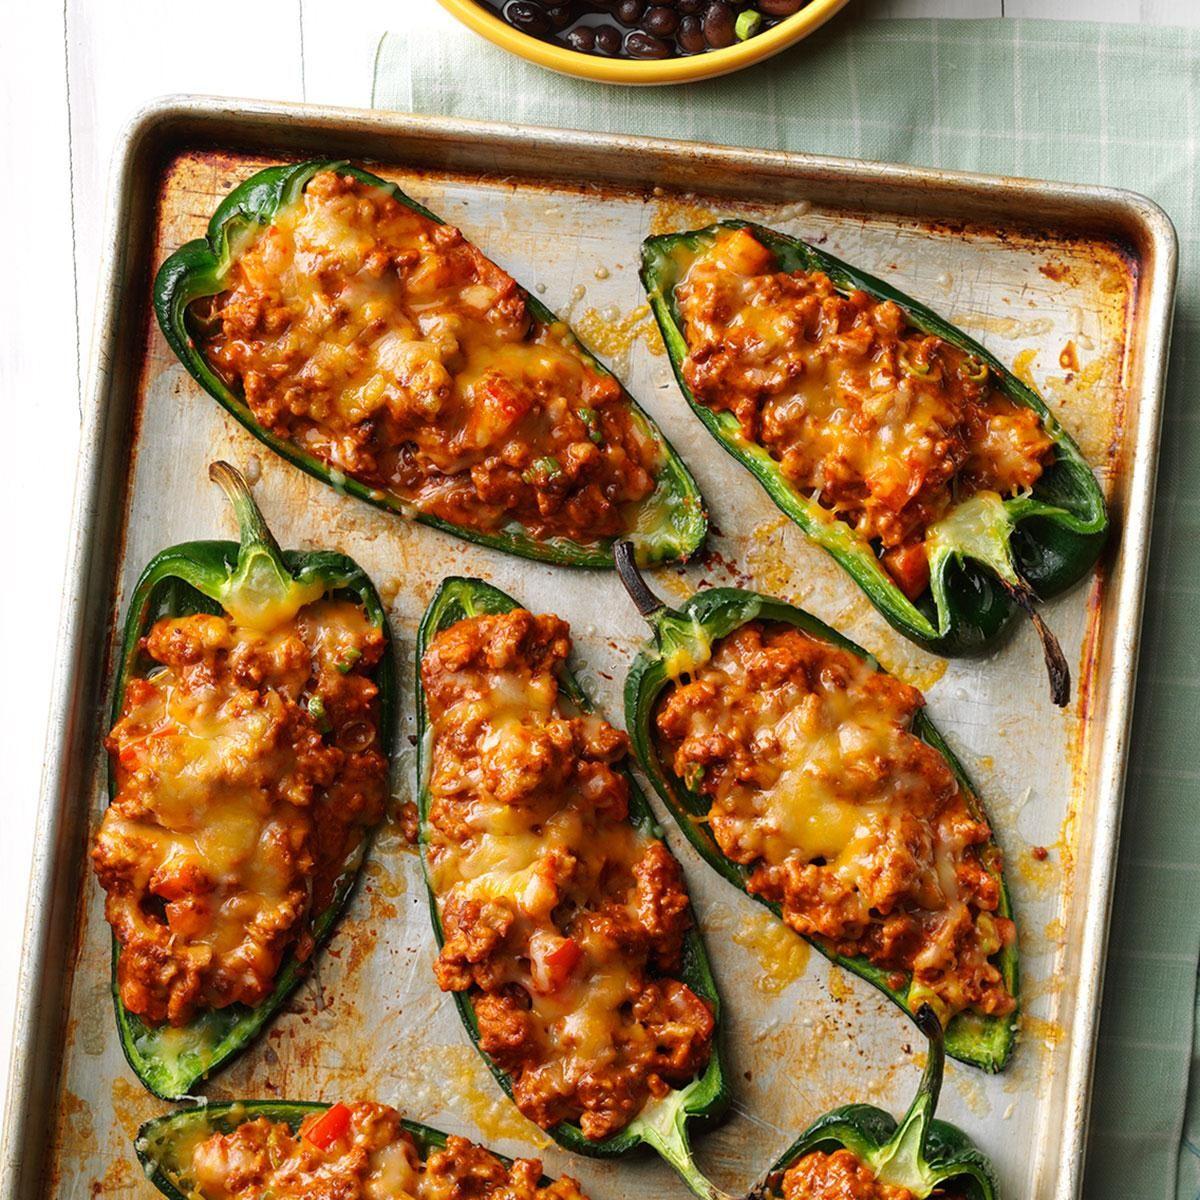 Chili Stuffed Poblano Peppers Recipe Stuffed Peppers Stuffed Poblano Peppers Sheet Pan Dinners Recipes